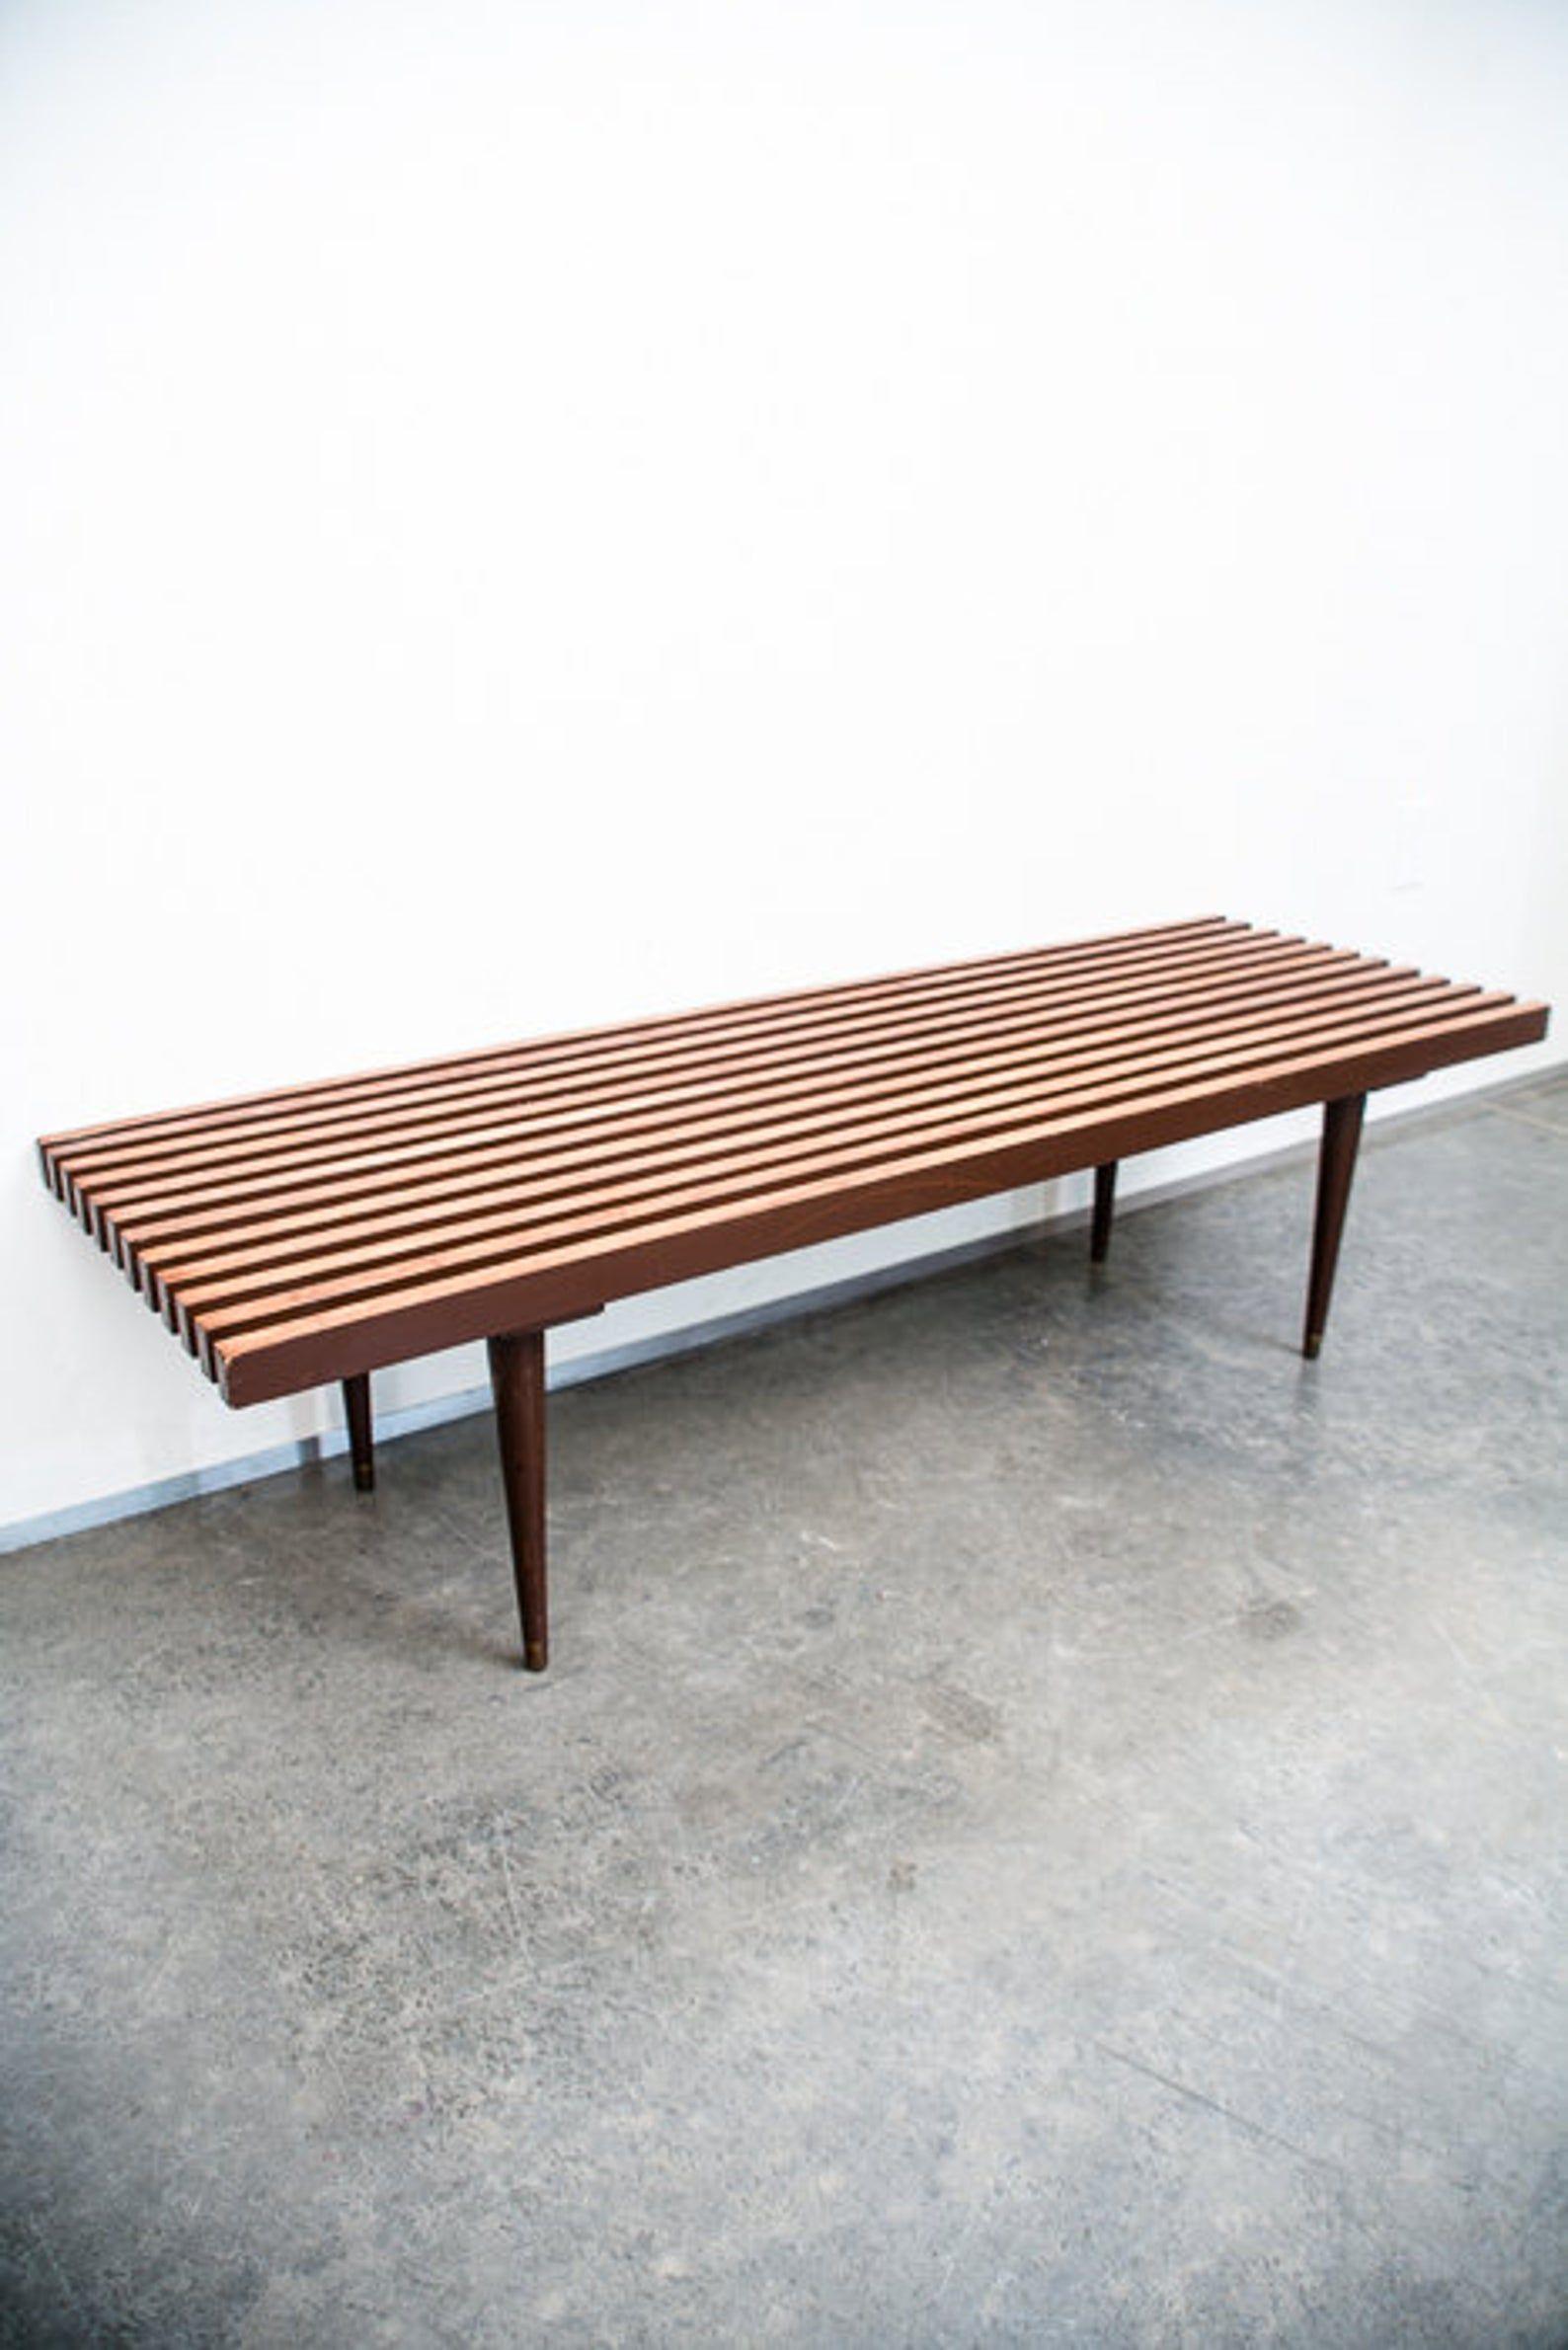 Sold Mid Century Modern Bench Slat Coffee Table Walnut Wood Danish Vintage Retro Danish 54 Inches Free Shipping Mid Century Modern Bench Modern Bench Mid Century [ 2380 x 1588 Pixel ]